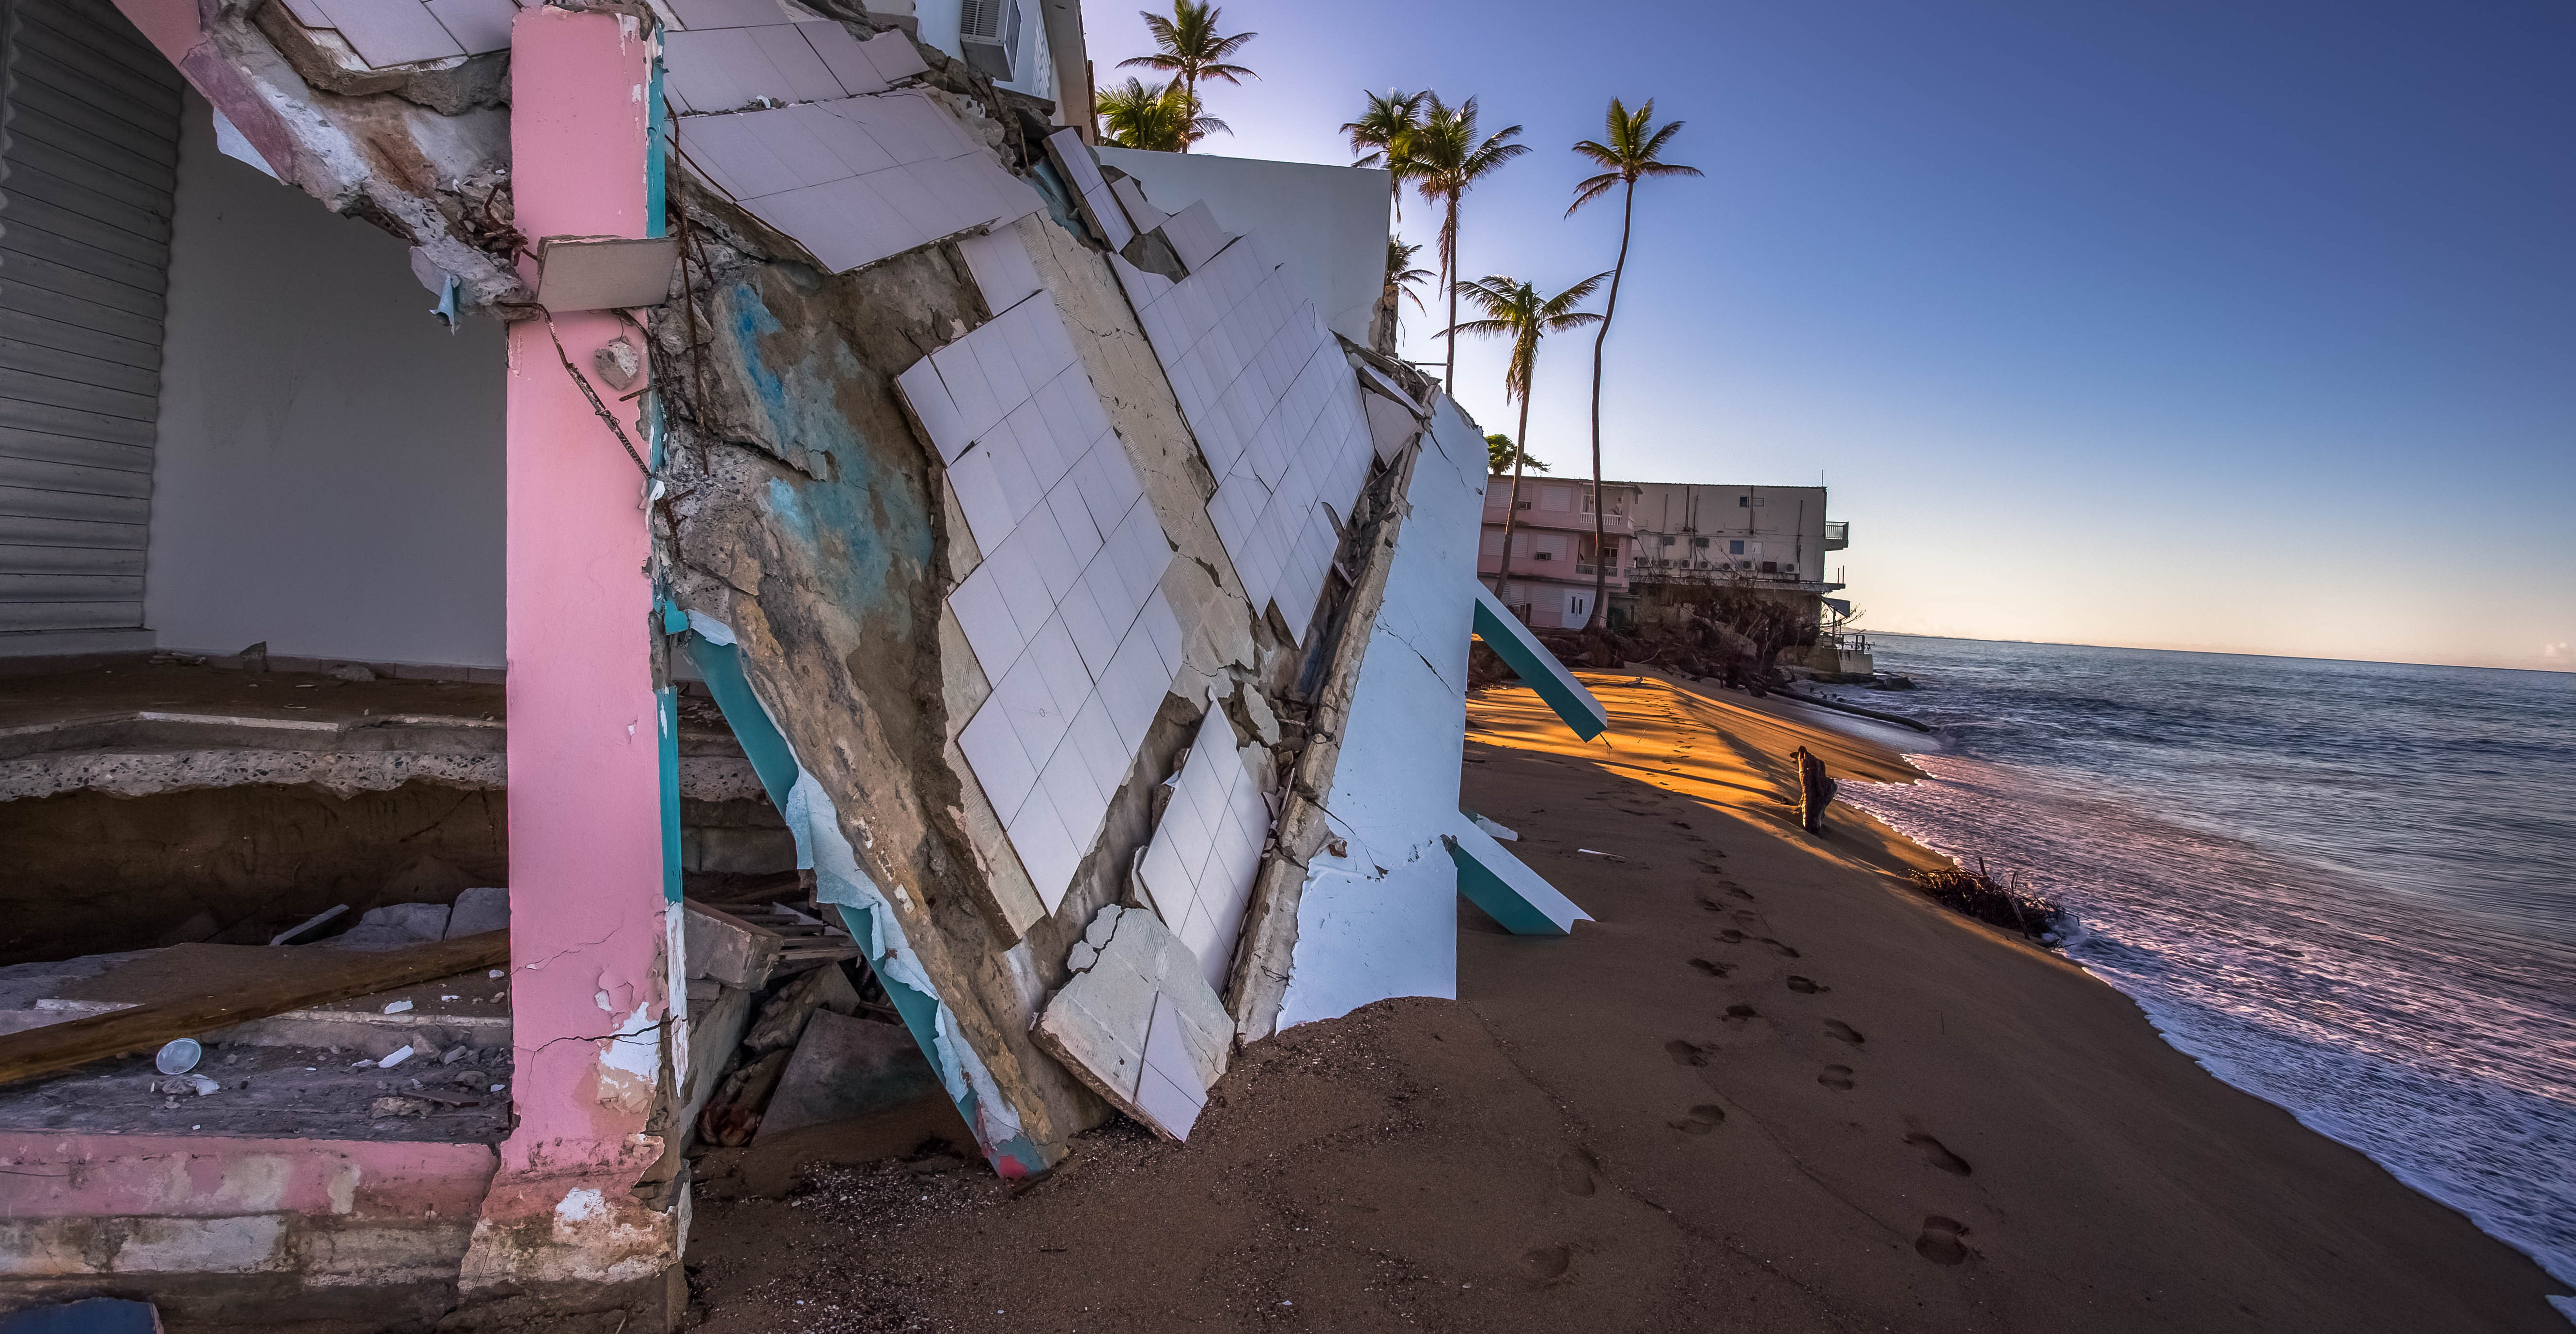 House After Hurricane Maria (Shutterstock/RaiPhoto)